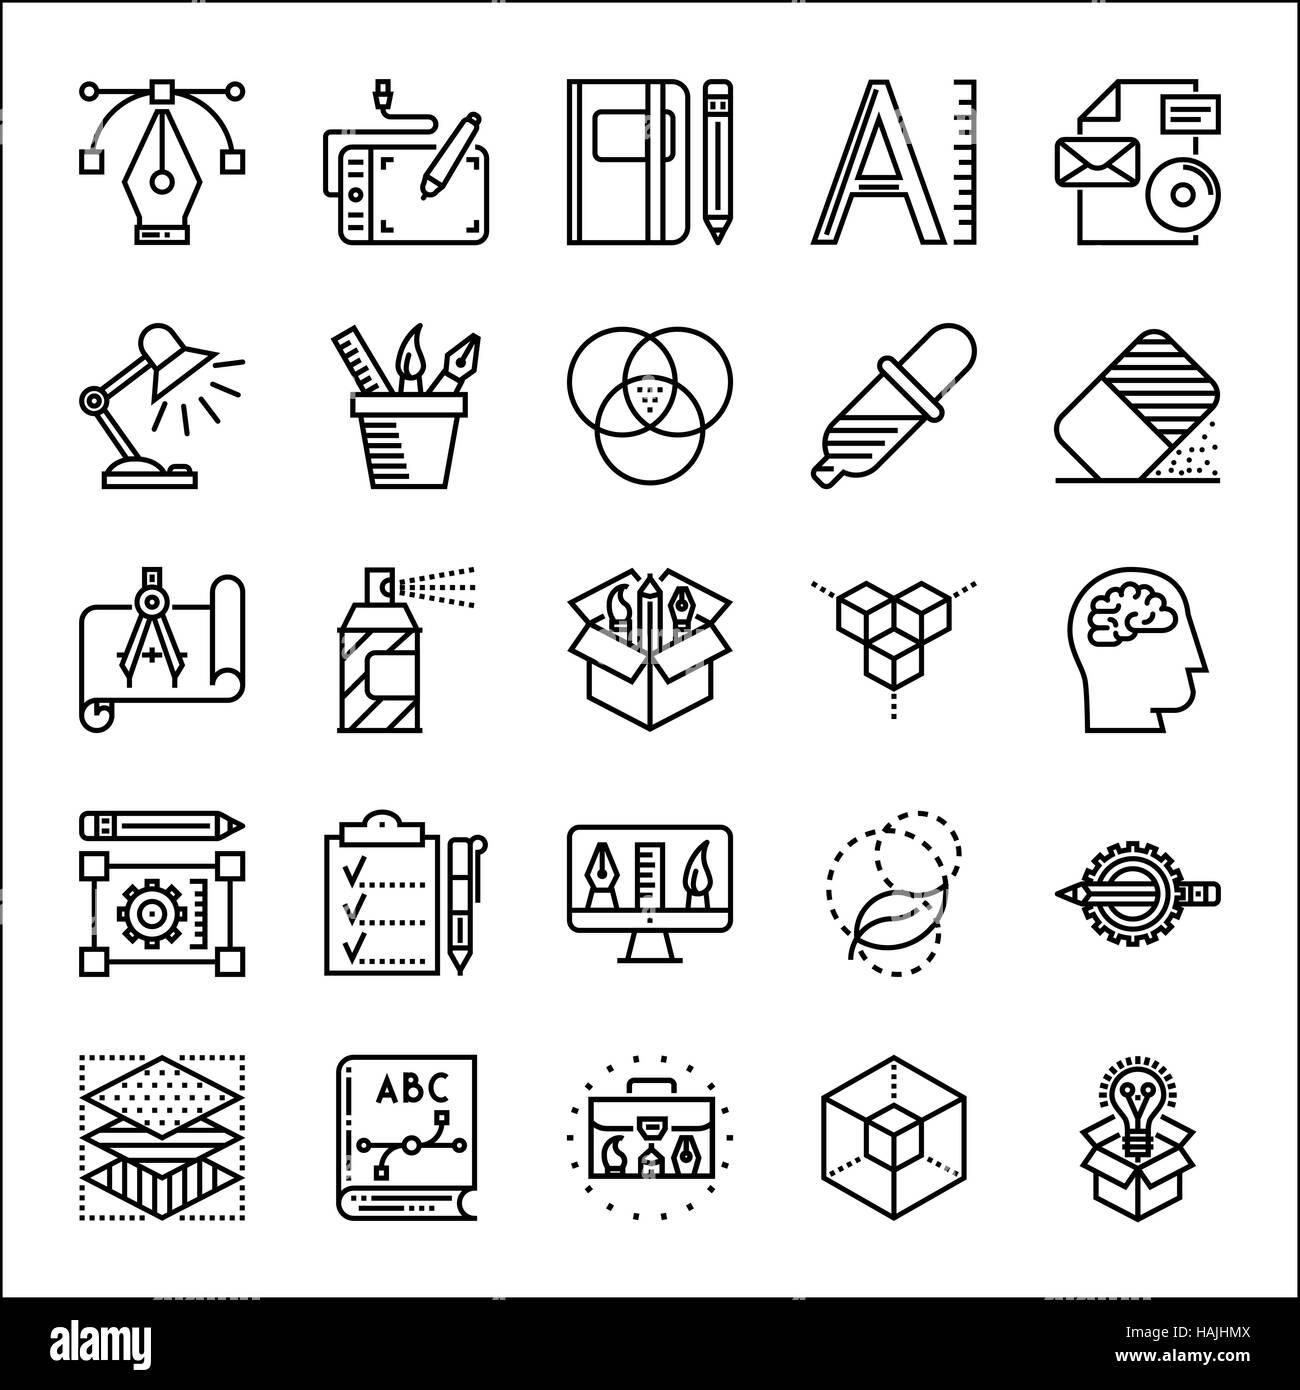 Graphic design thin line icons set, vector illustration - Stock Image